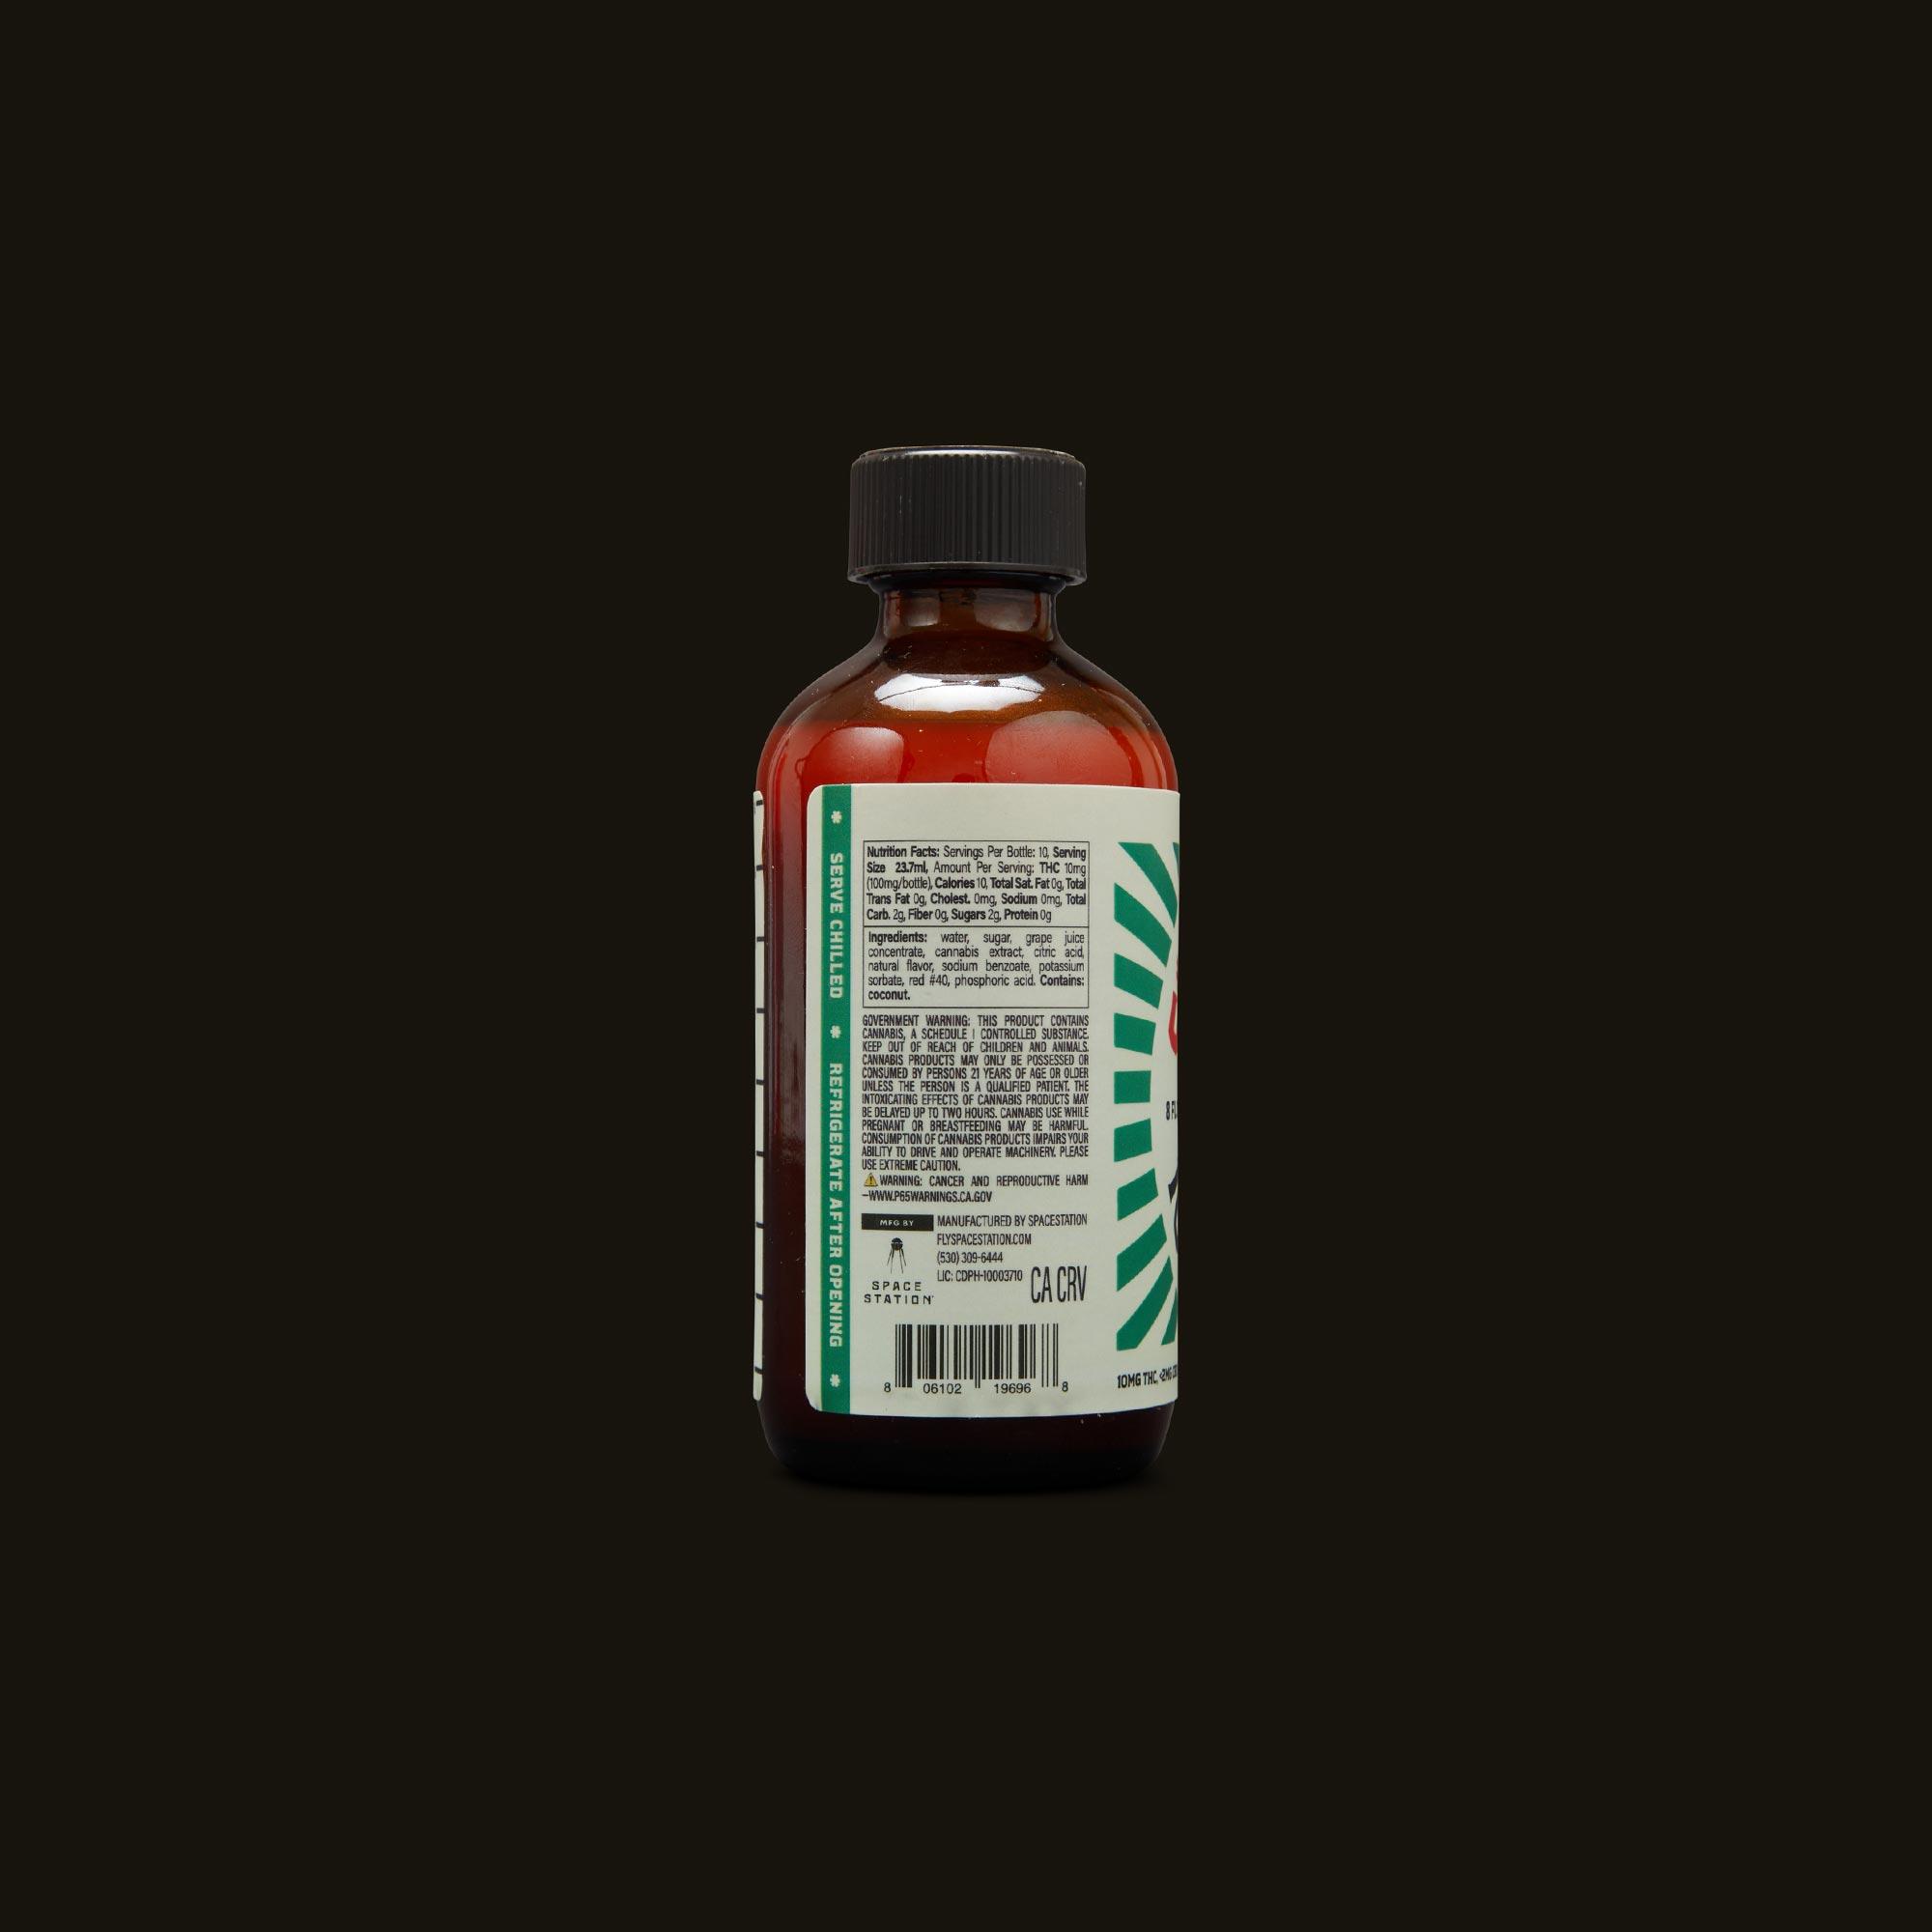 S-Shots Watermelon Punch Ingredients